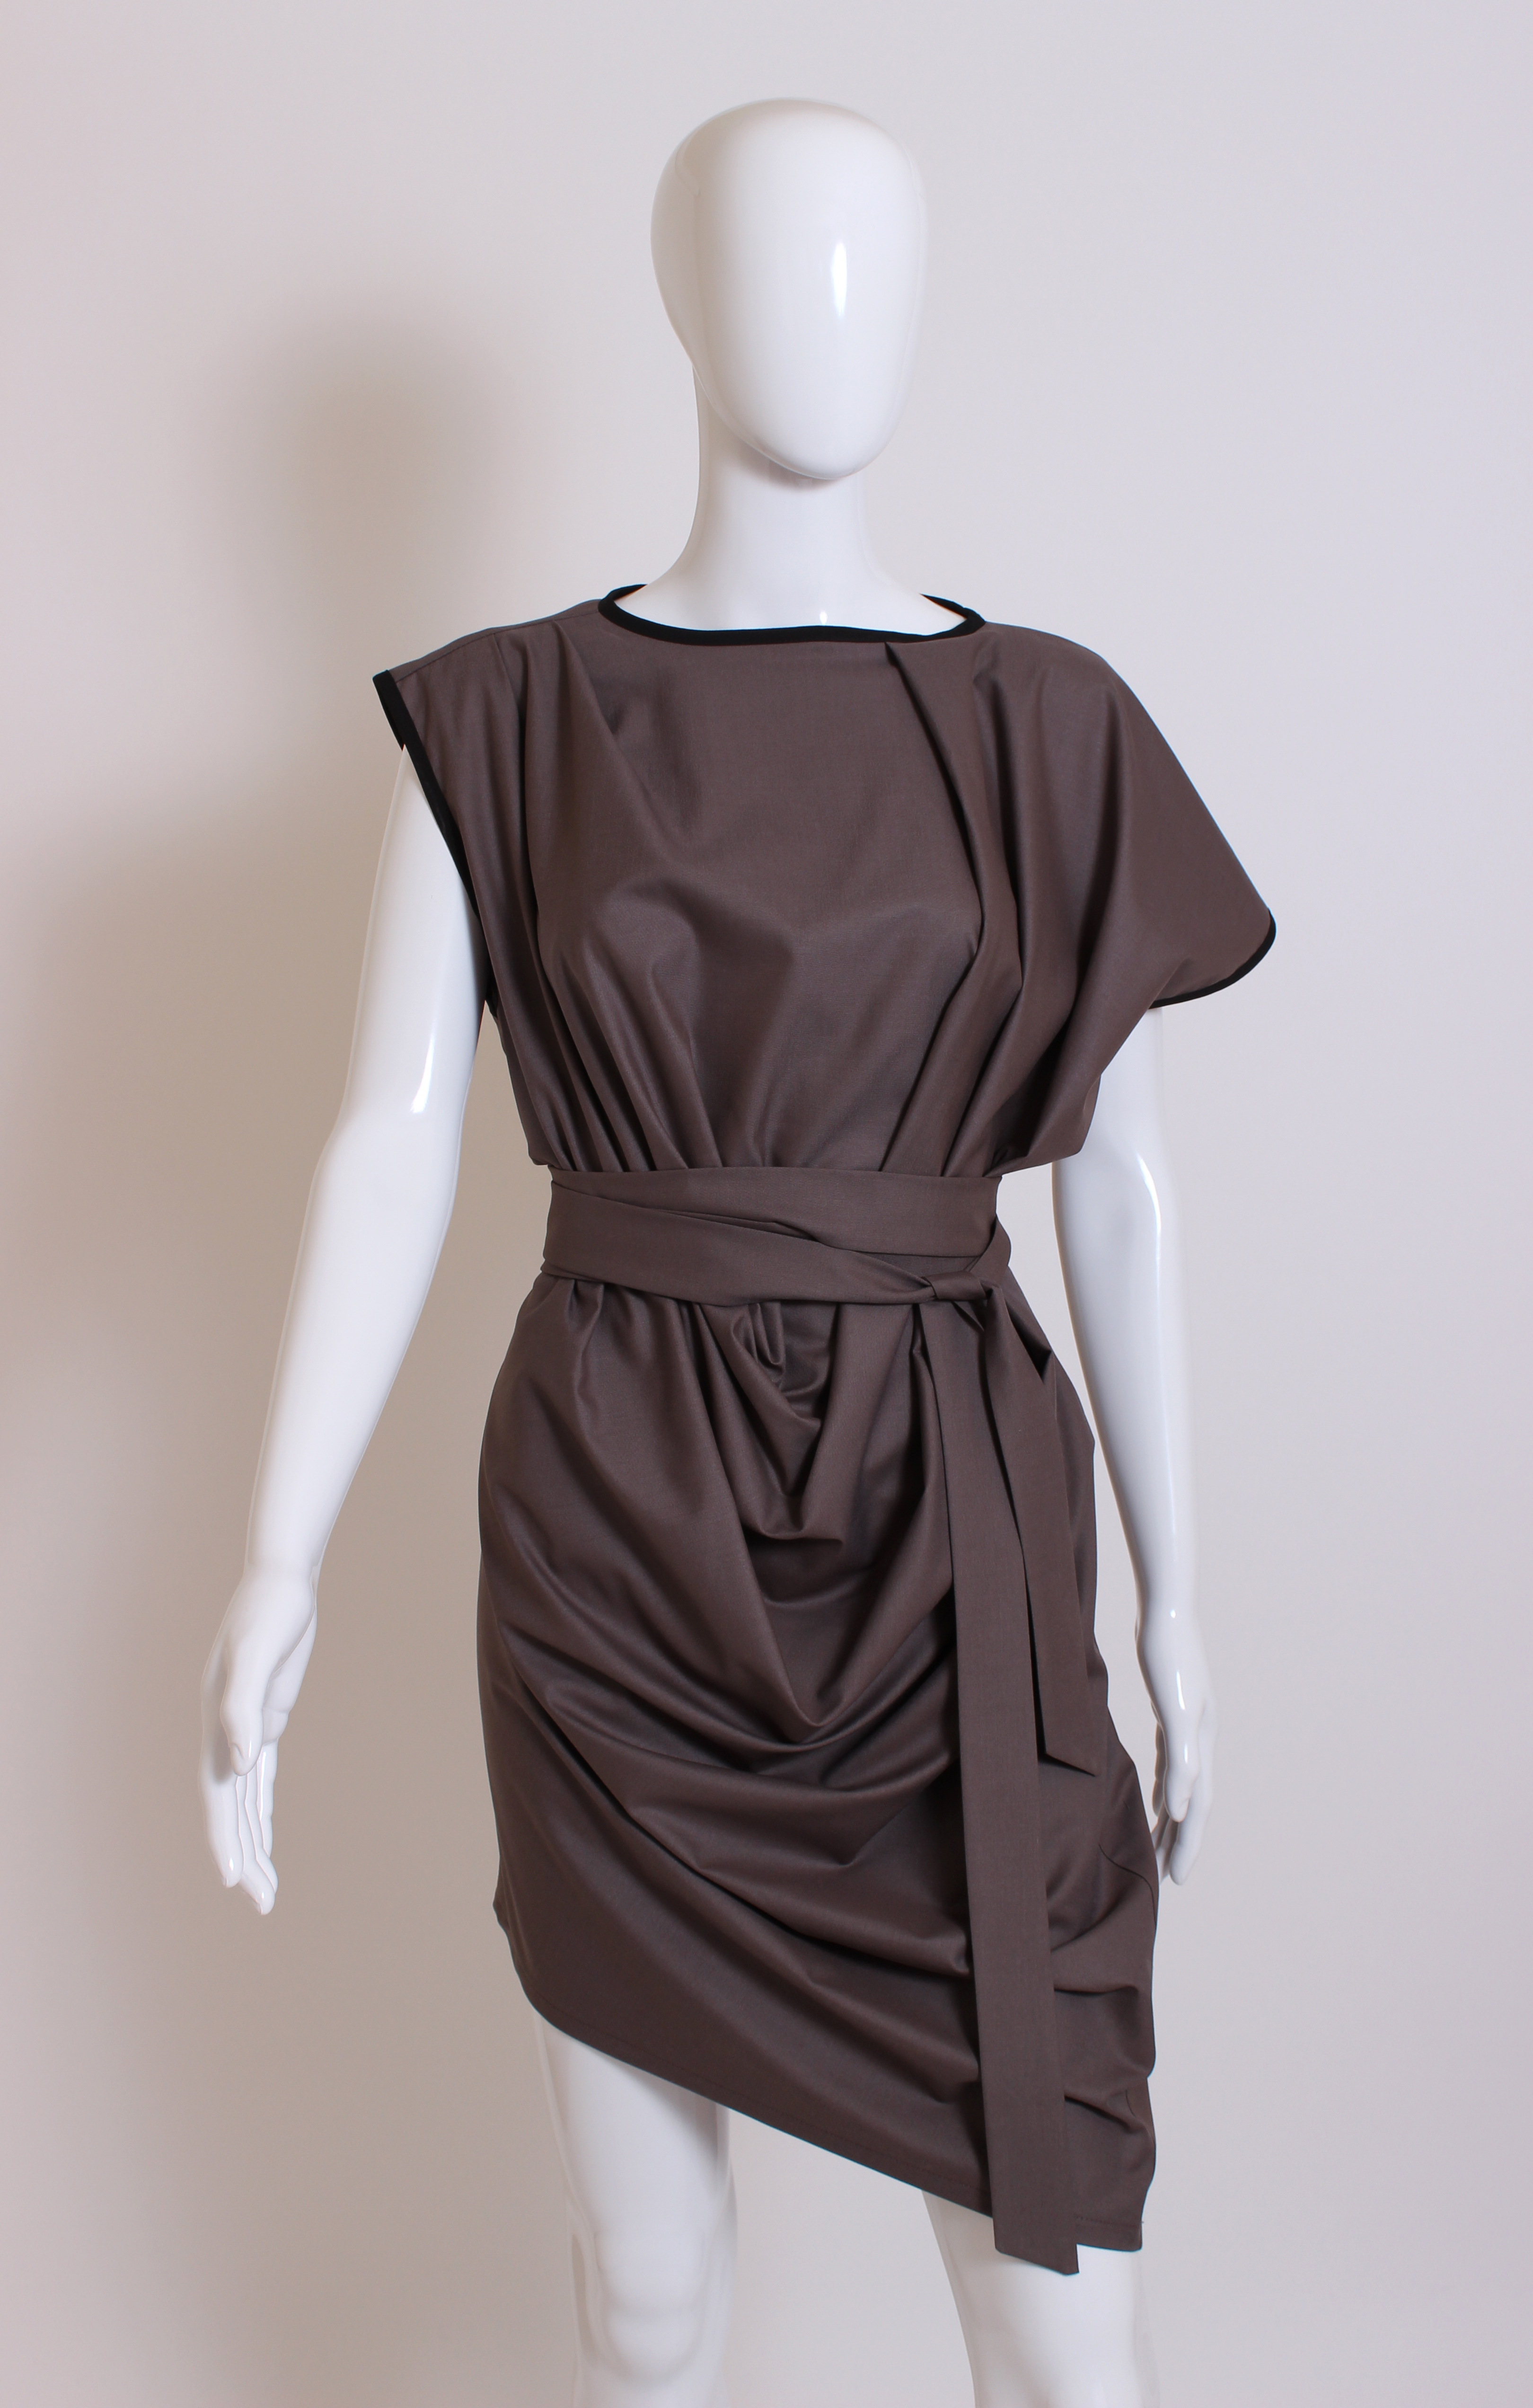 Polina Petrova Atelier&Boutique  - BulgarianTextile.com